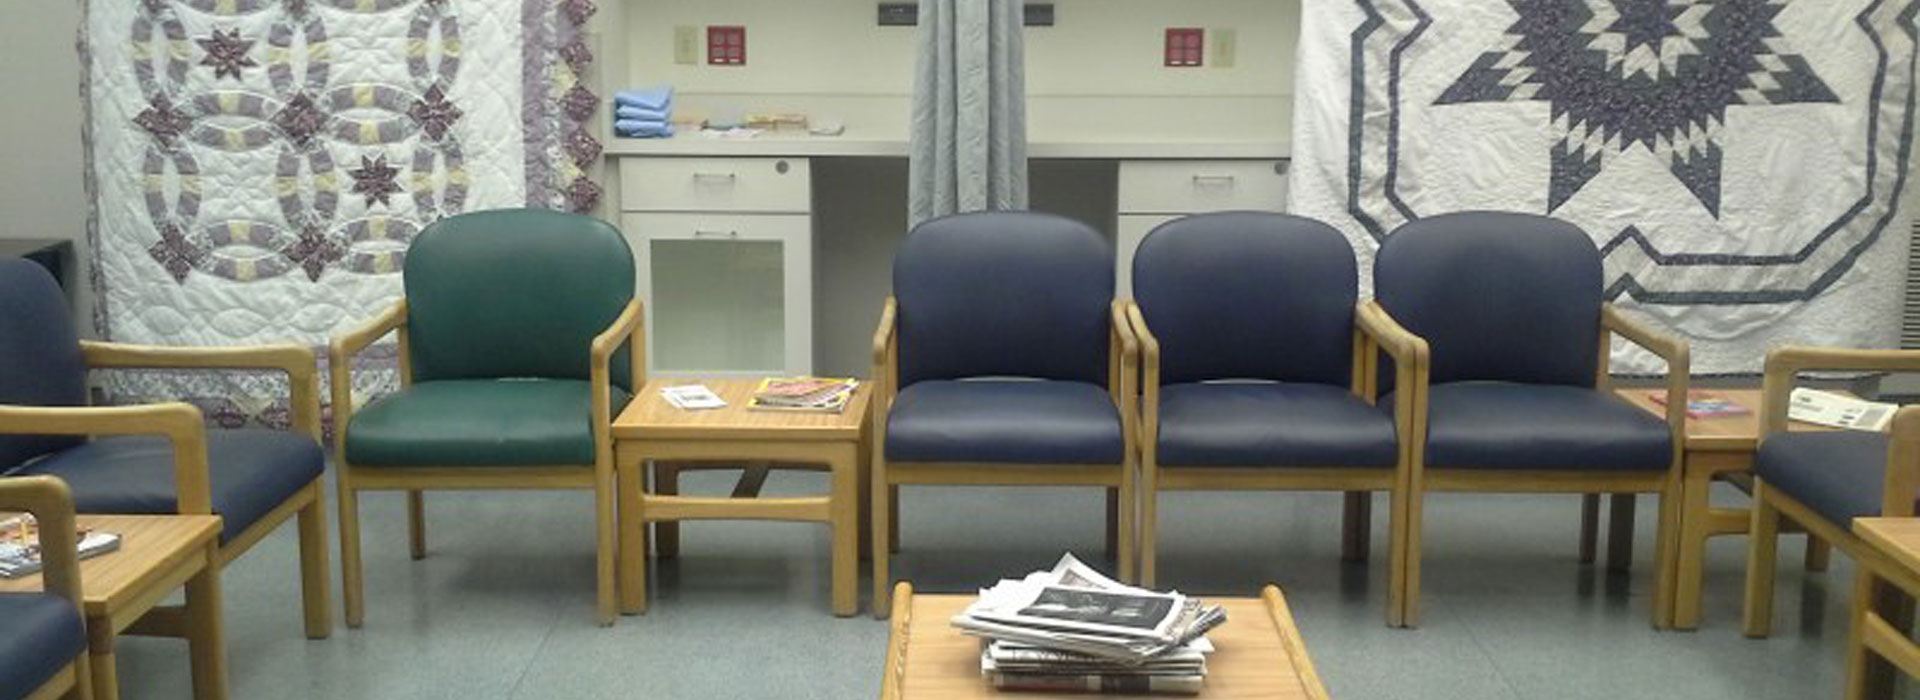 Good Neighbor Clinic Waiting Room